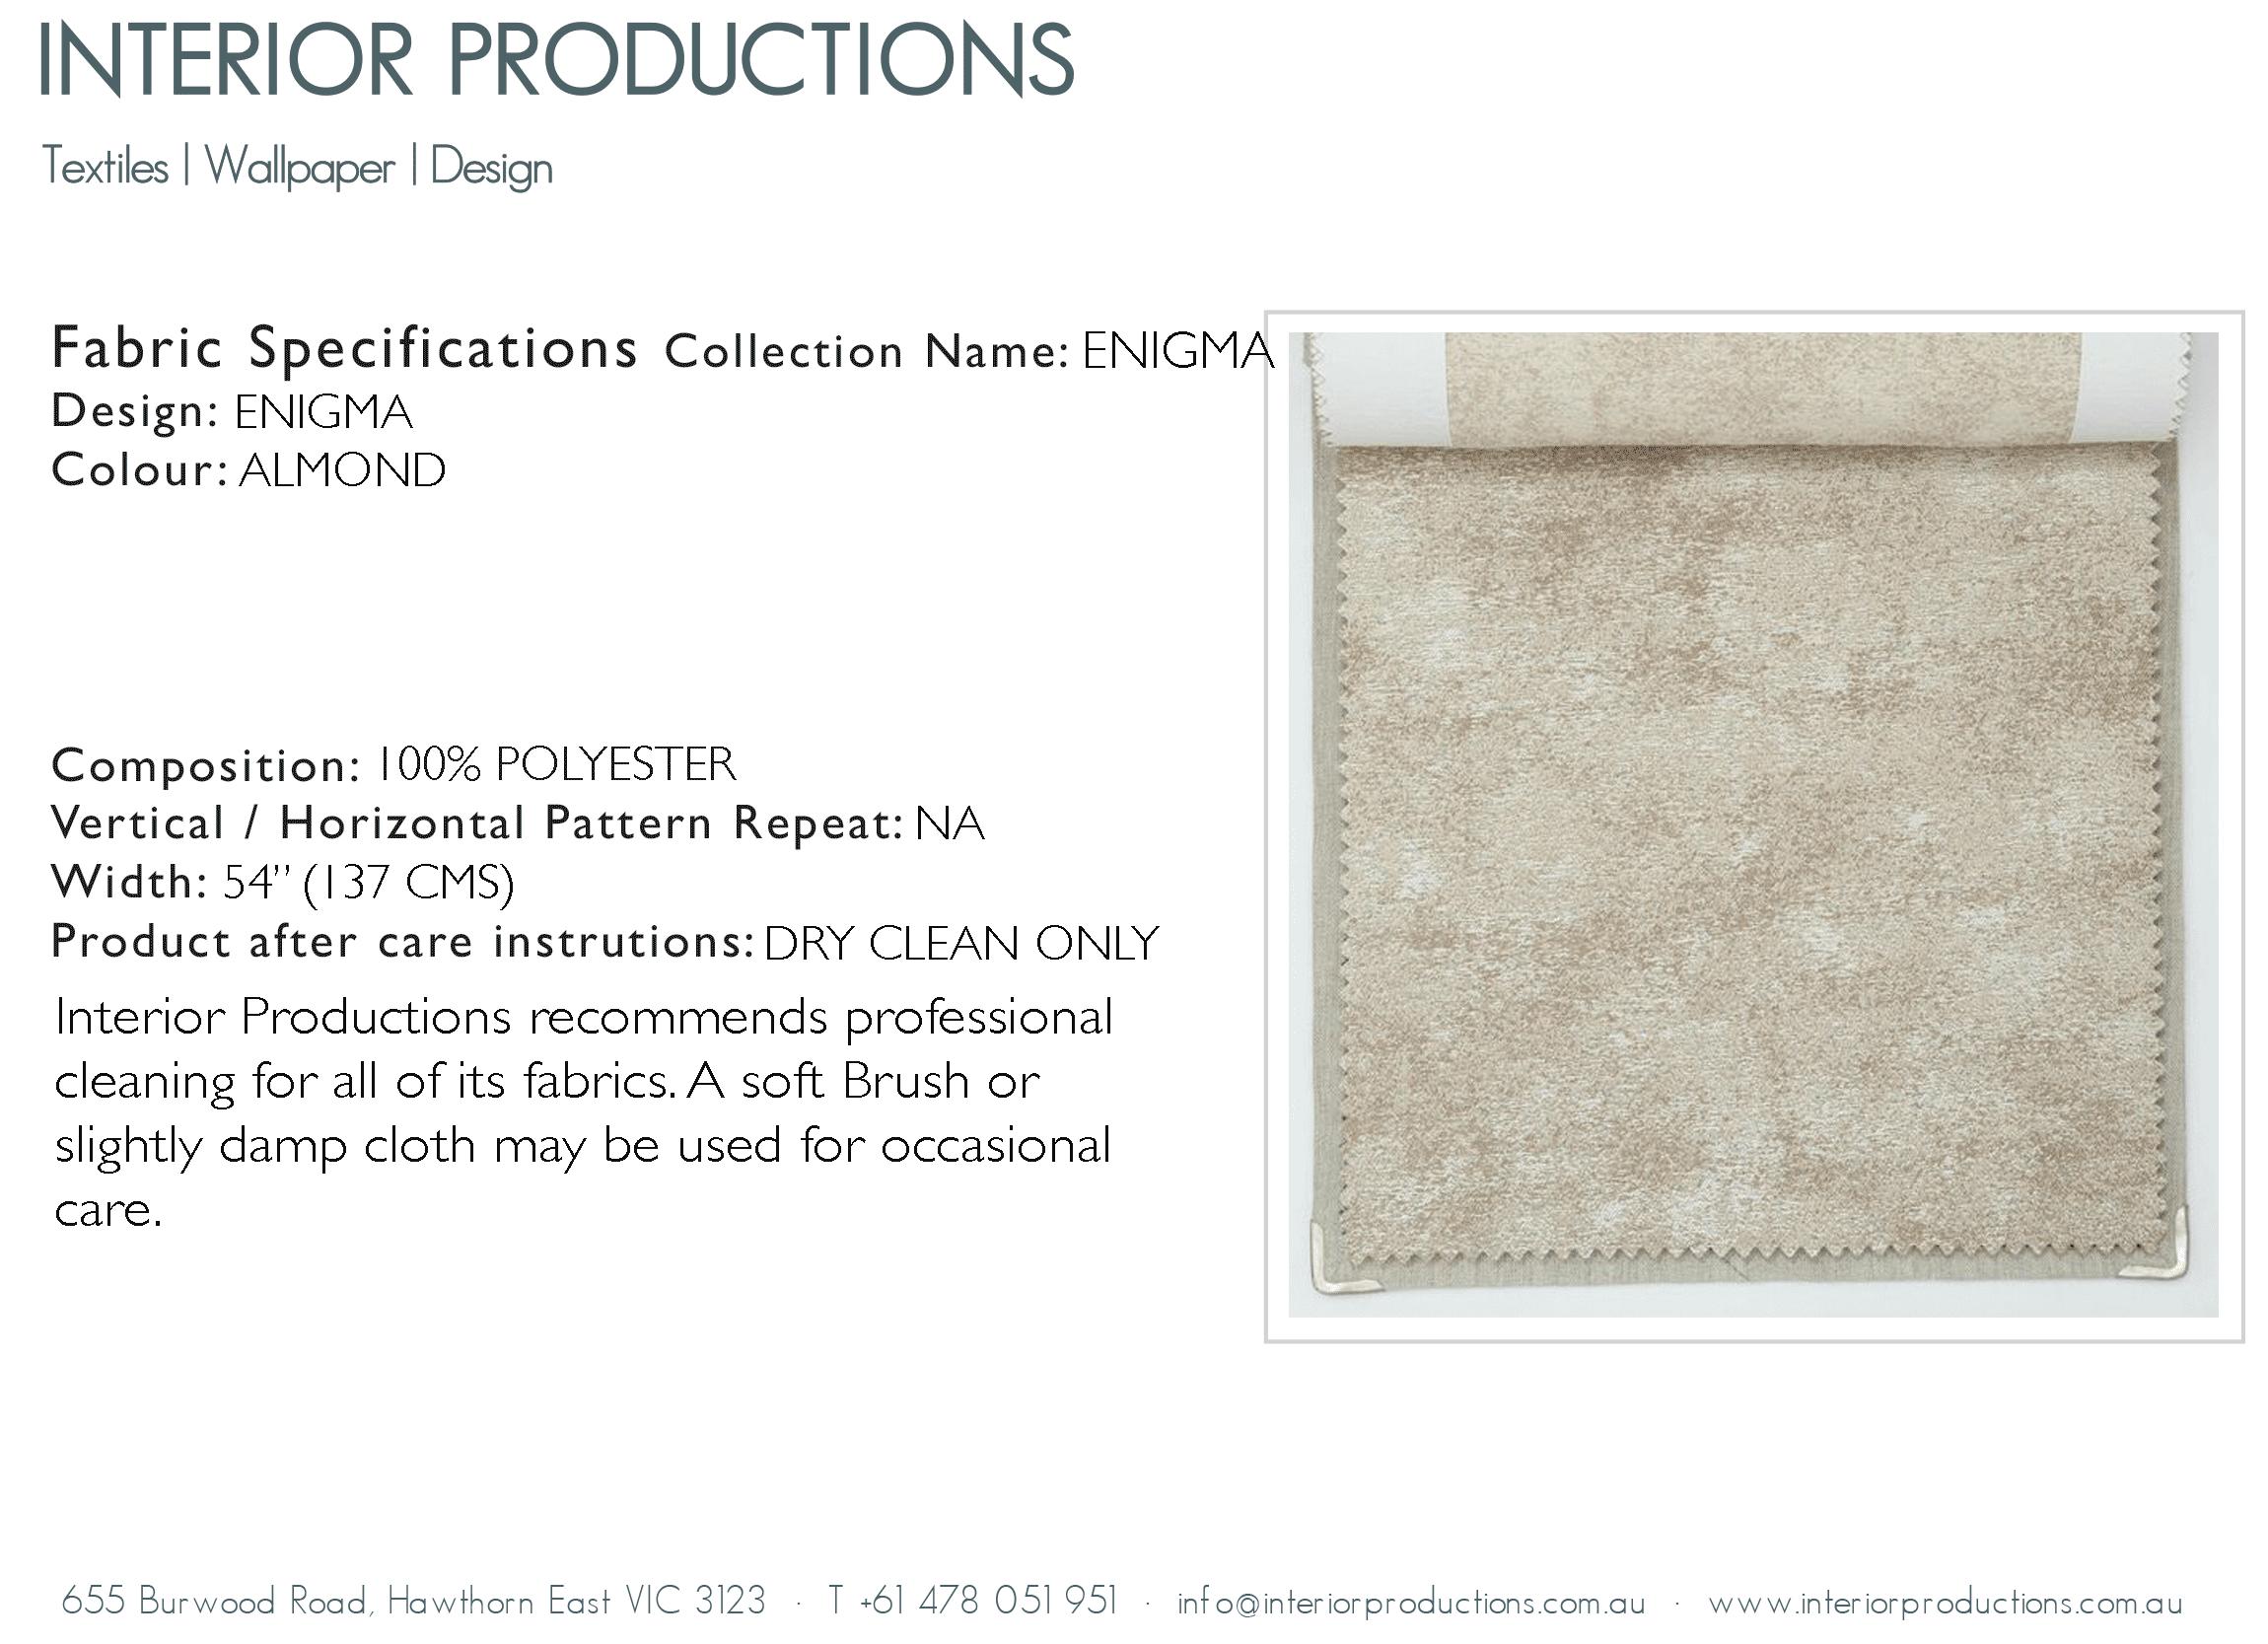 interior_productions_ENIGMA---ALMOND